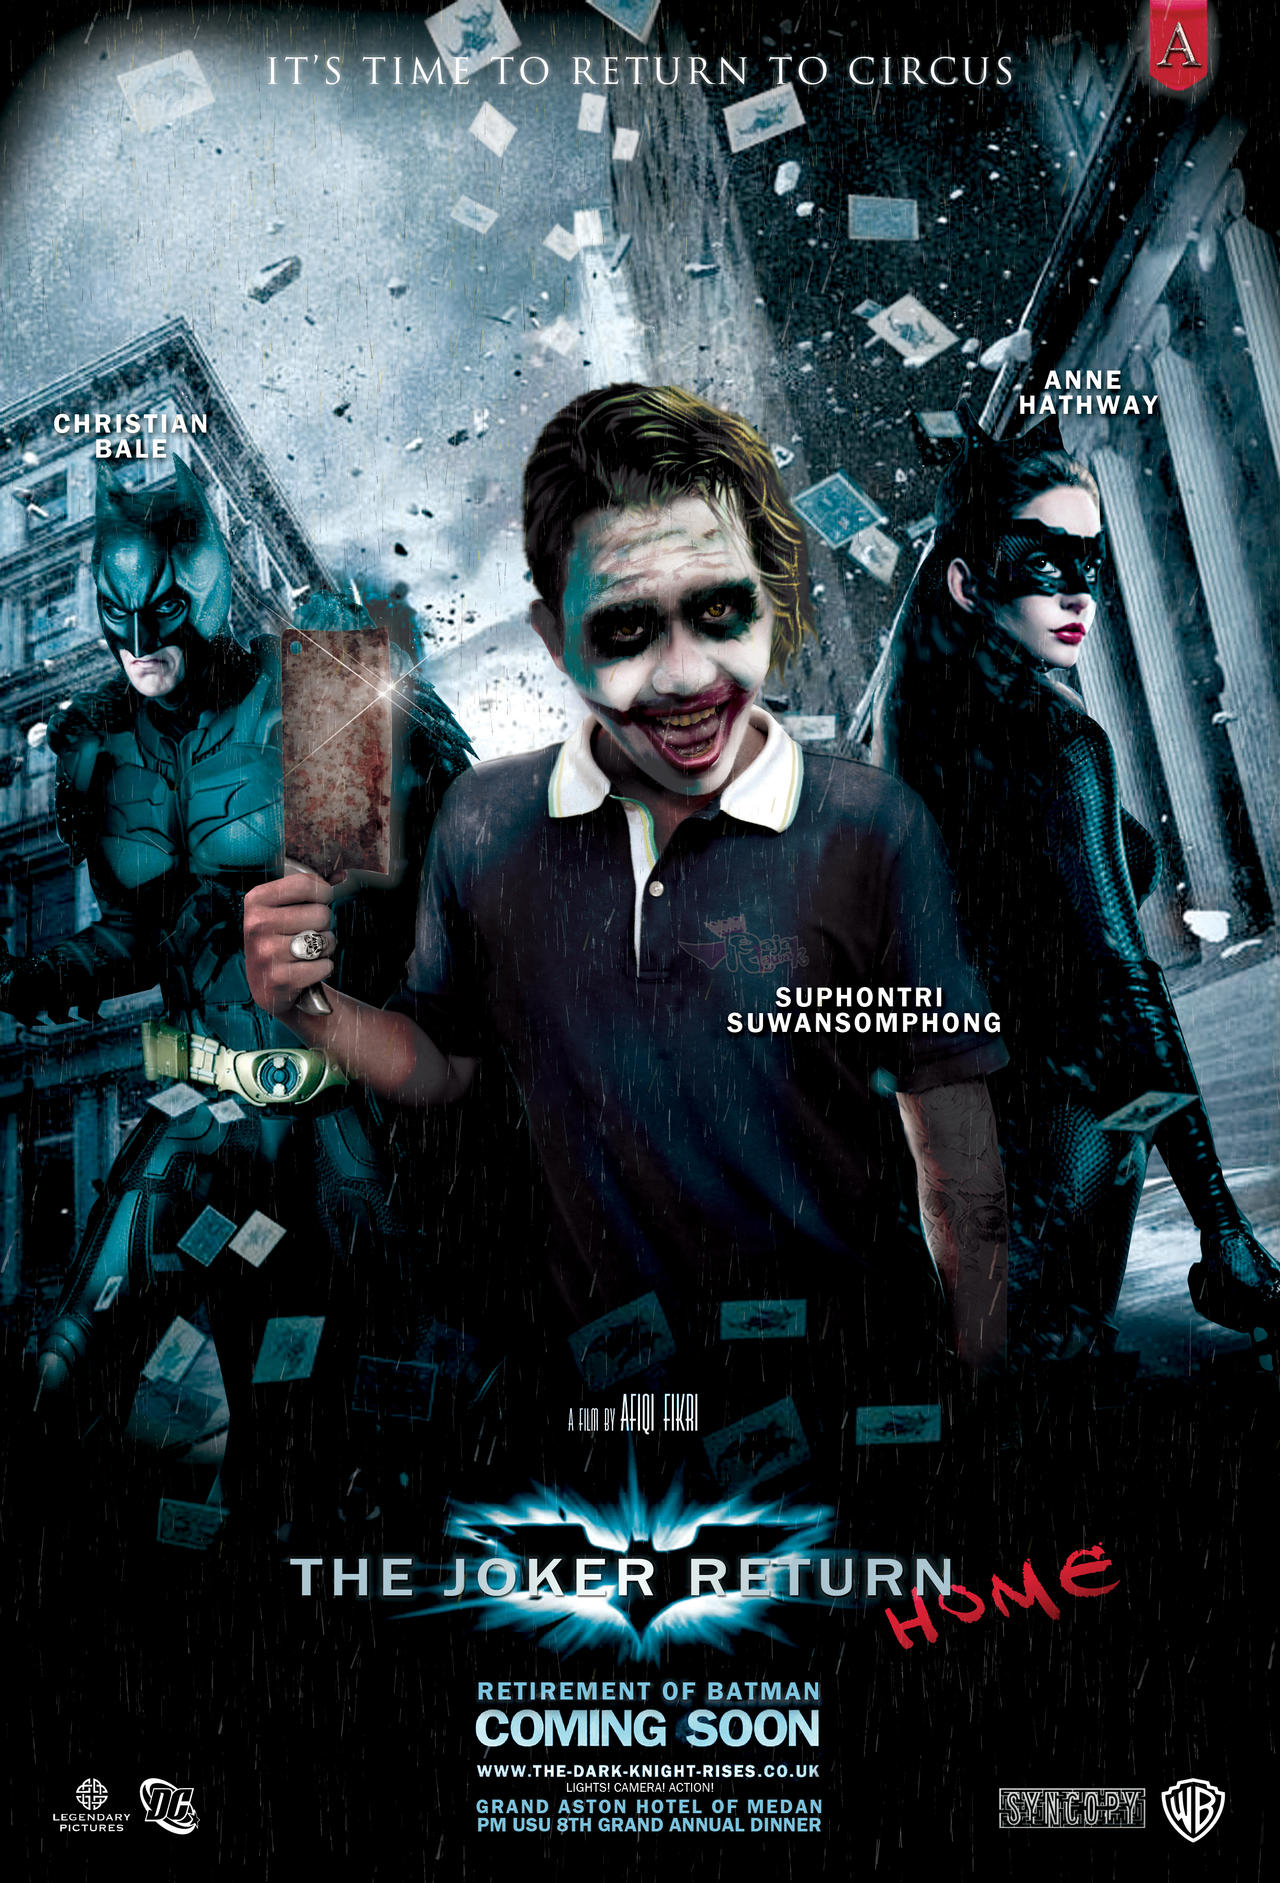 Poster Parody: The Joker Return HOME by Afiqi